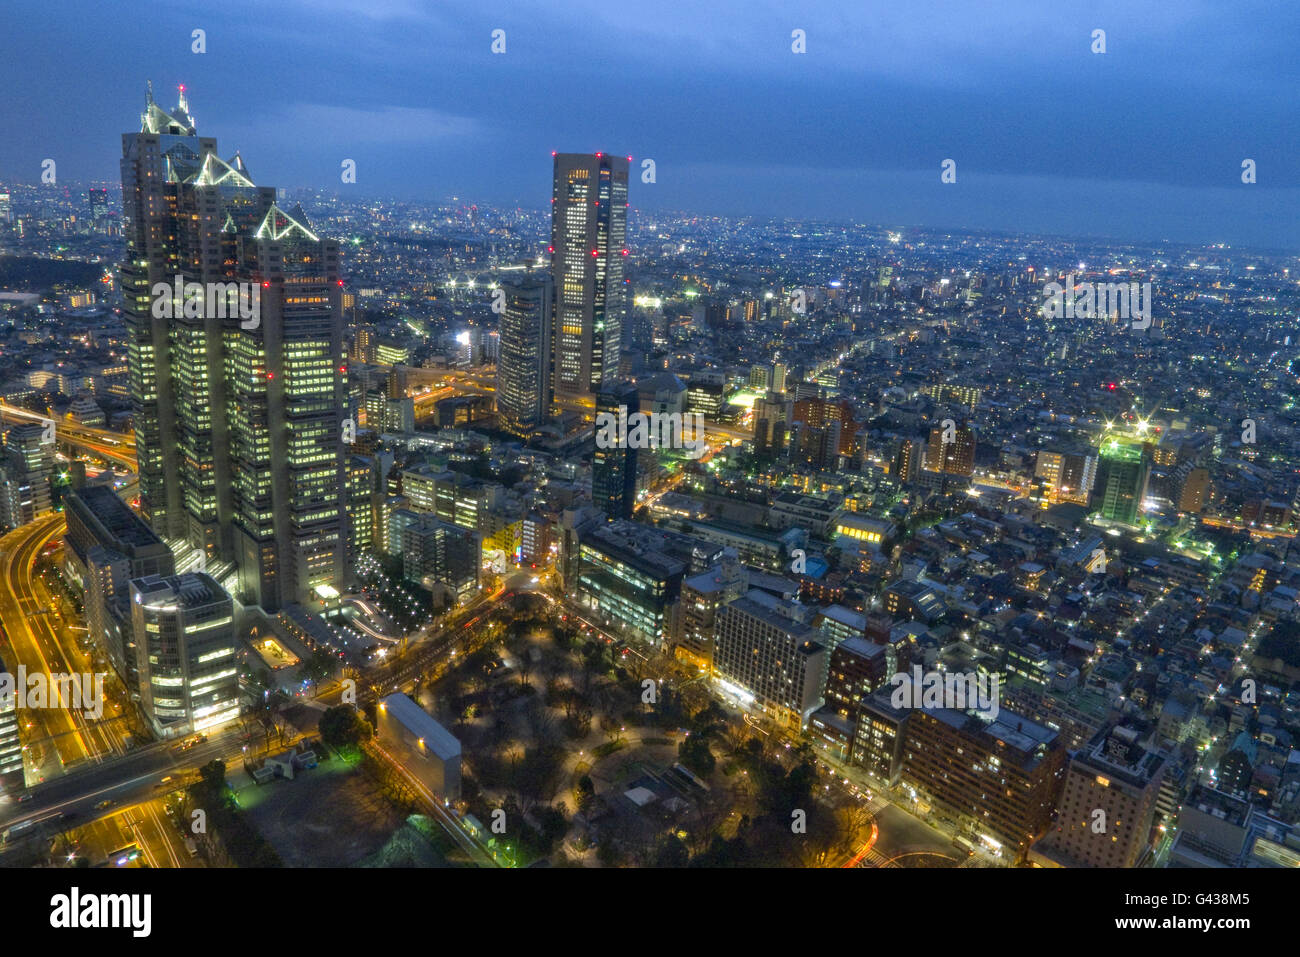 Panoramic view from the Government Building, Tokyo, Japan    Credit © Fabio Mazzarella/Sintesi/Alamy Stock - Stock Image